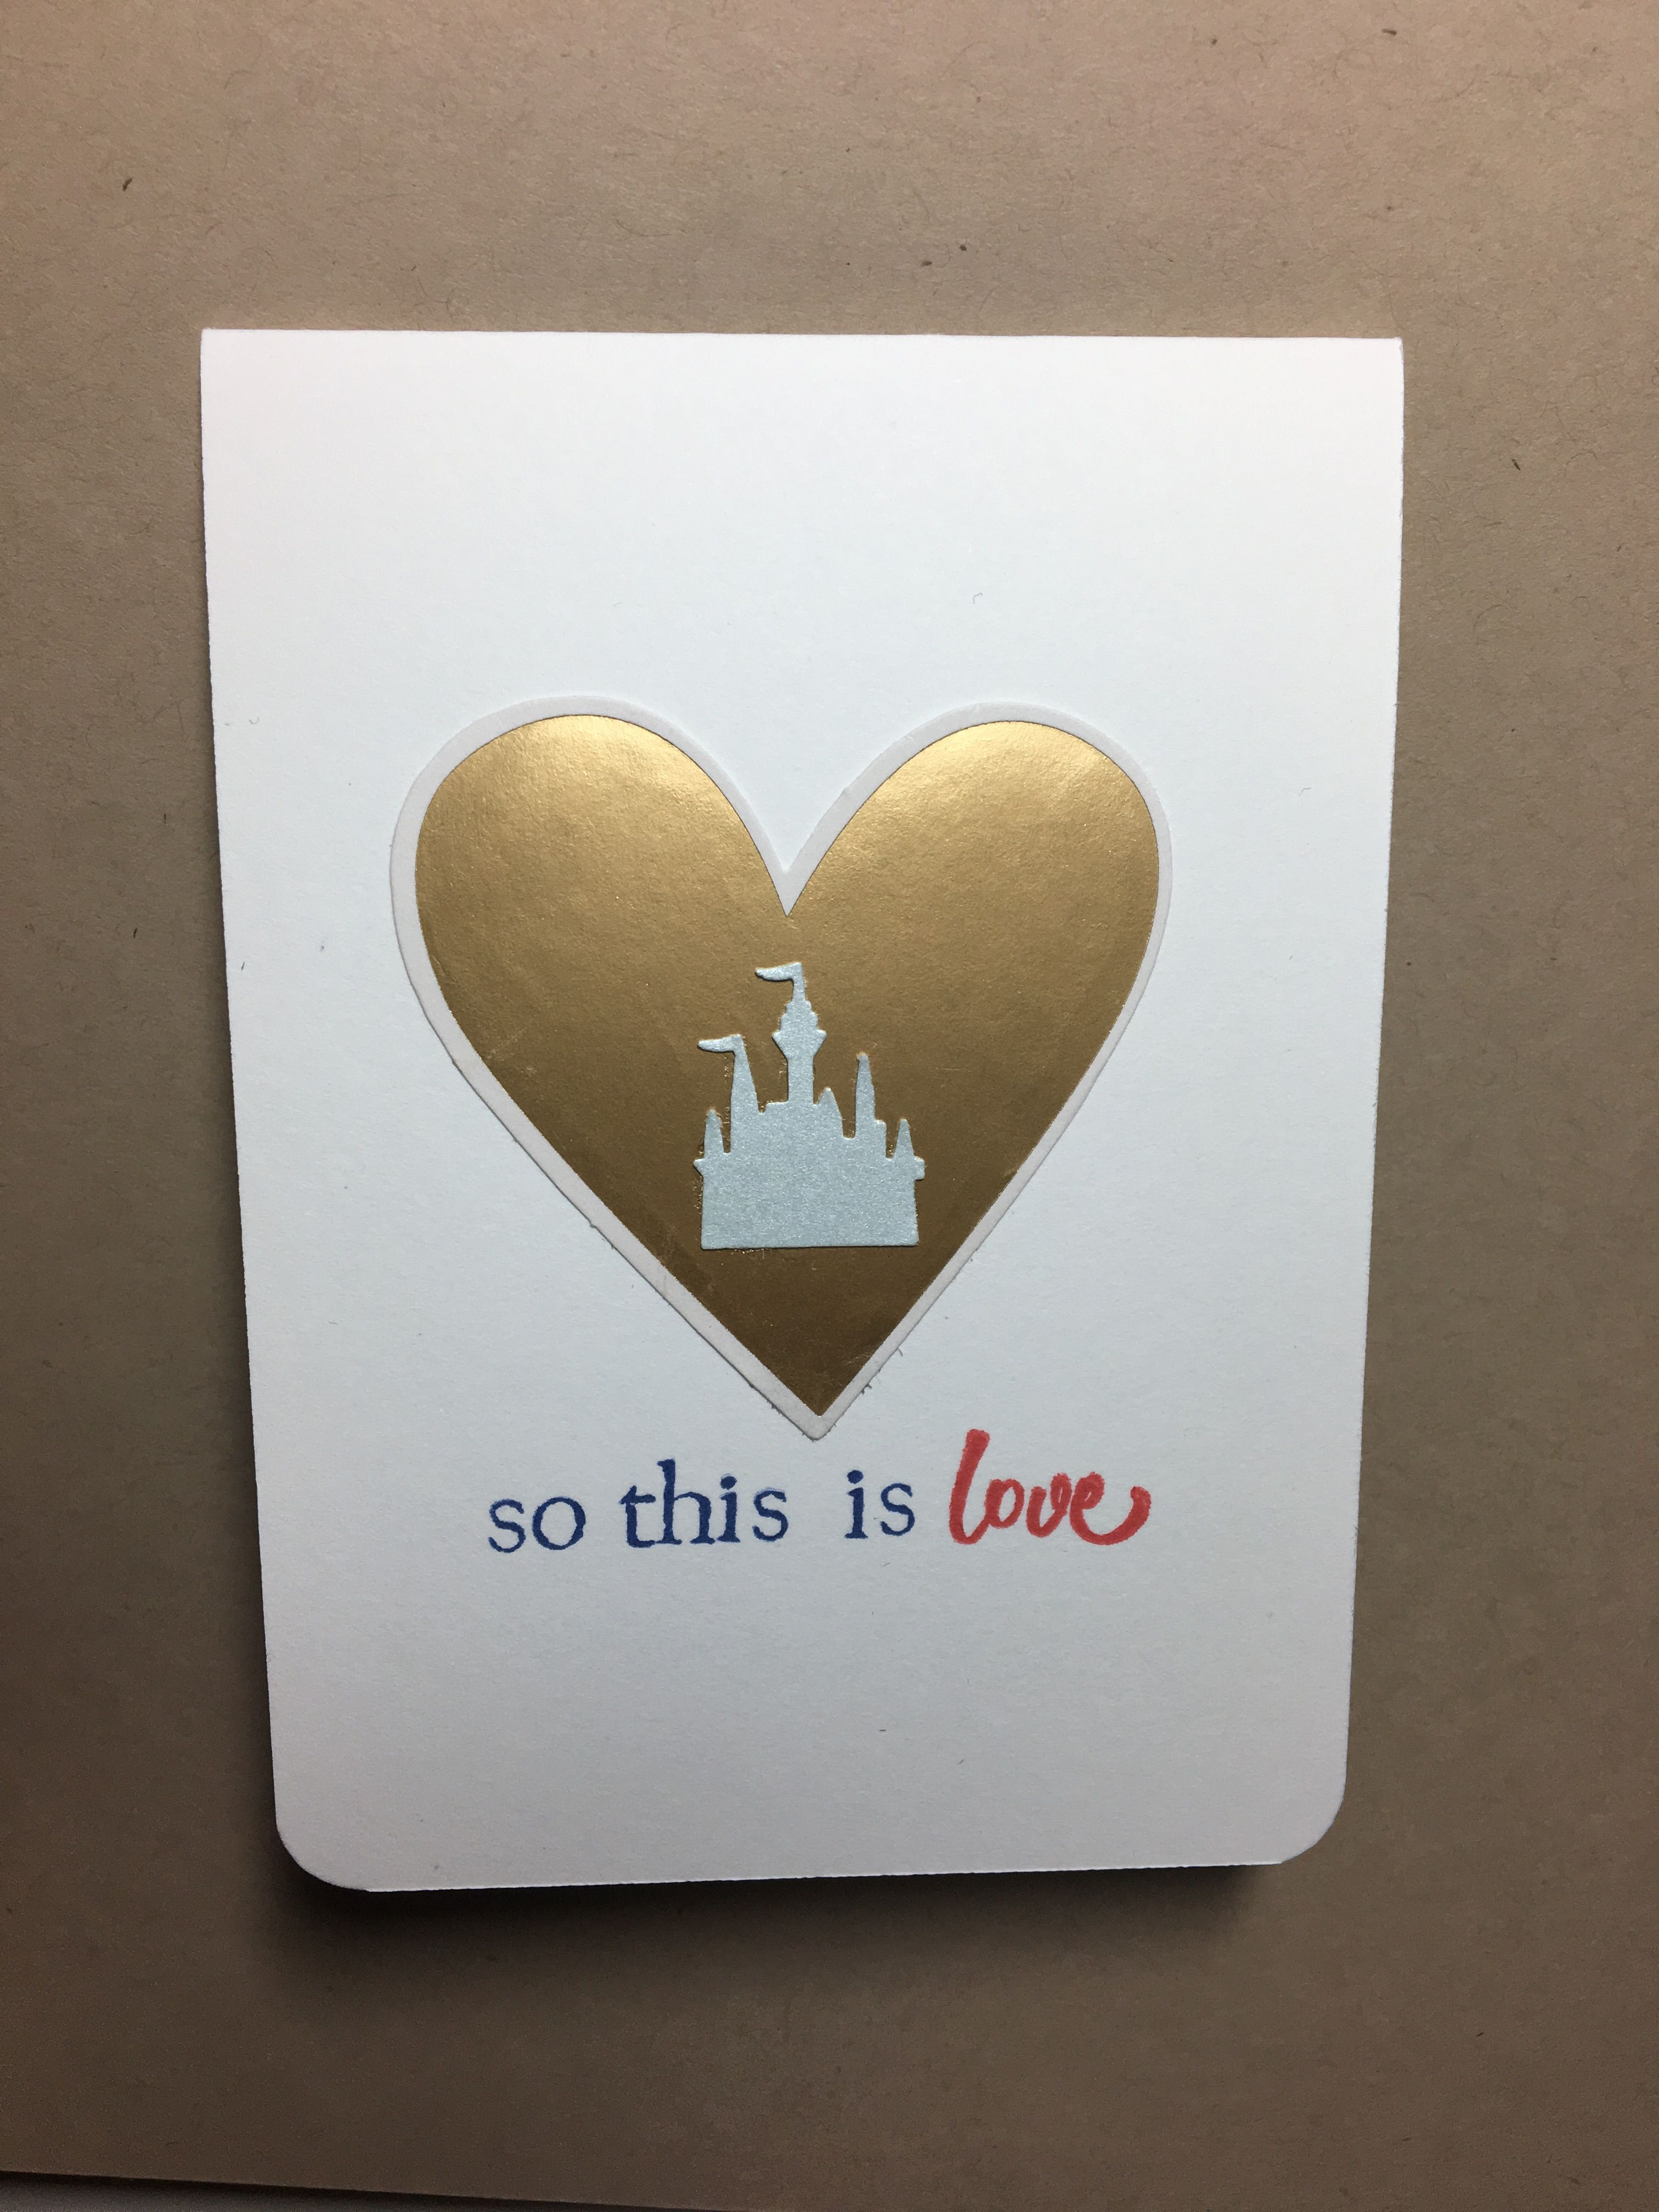 Disney Themed Anniversary Or Wedding Card Madebyejp2019 Cards Cards Handmade Wedding Cards